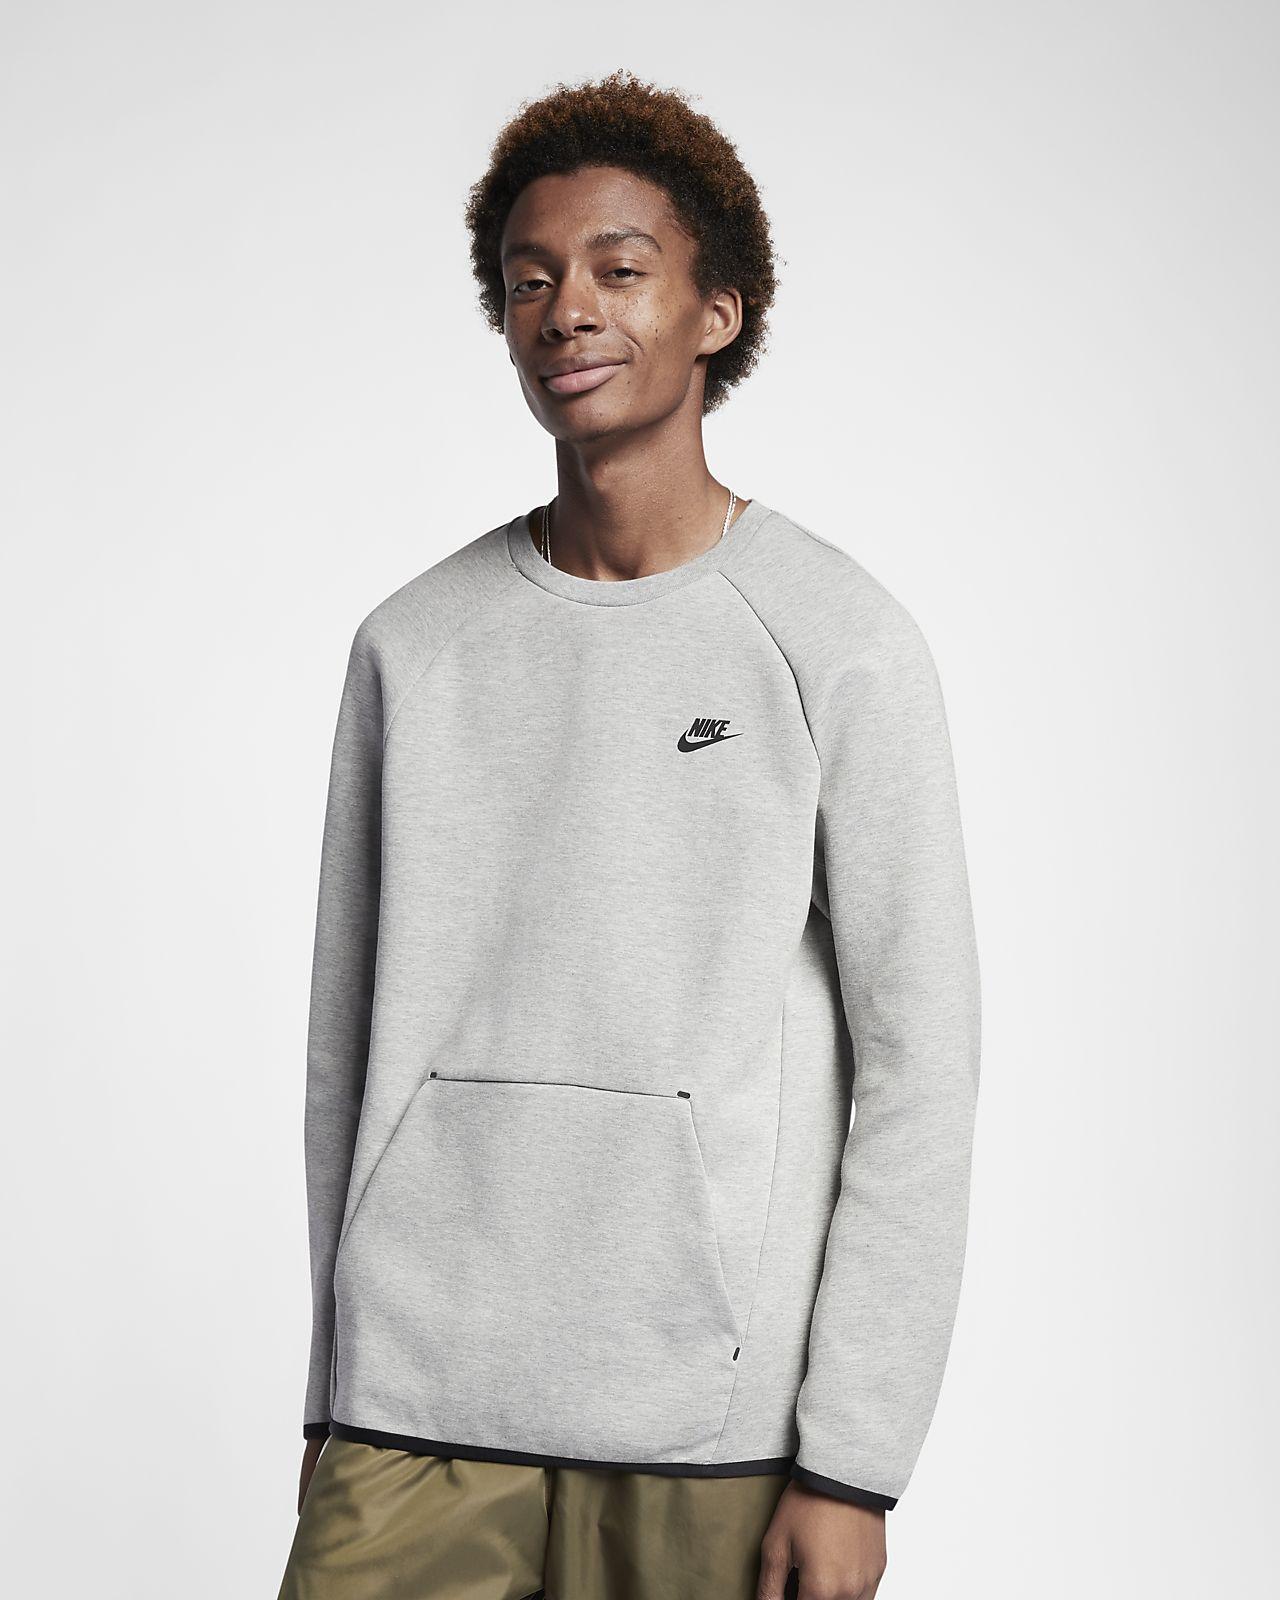 Nike Sudadera Sportswear Fleece Manga De Hombre Tech Larga kXTPwiOZul